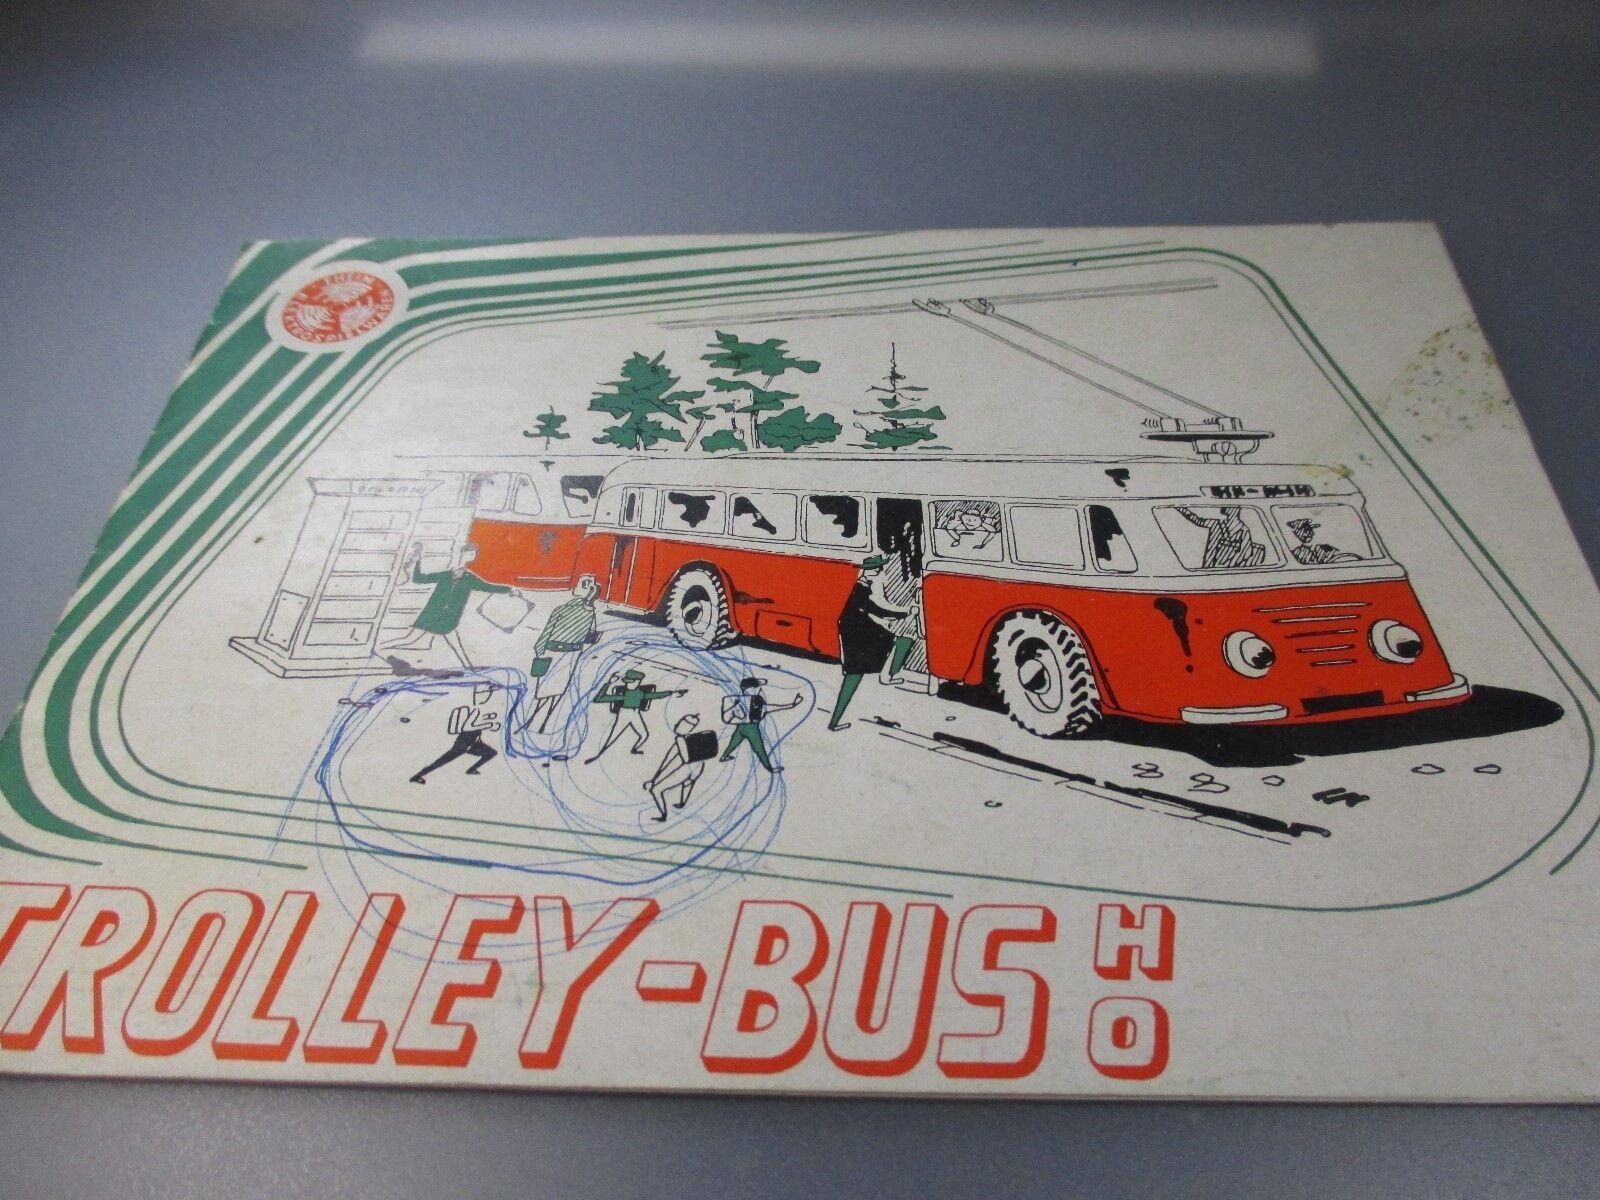 EHEIM TROLLEY BUS bildpreisliste catalogue (gk110)